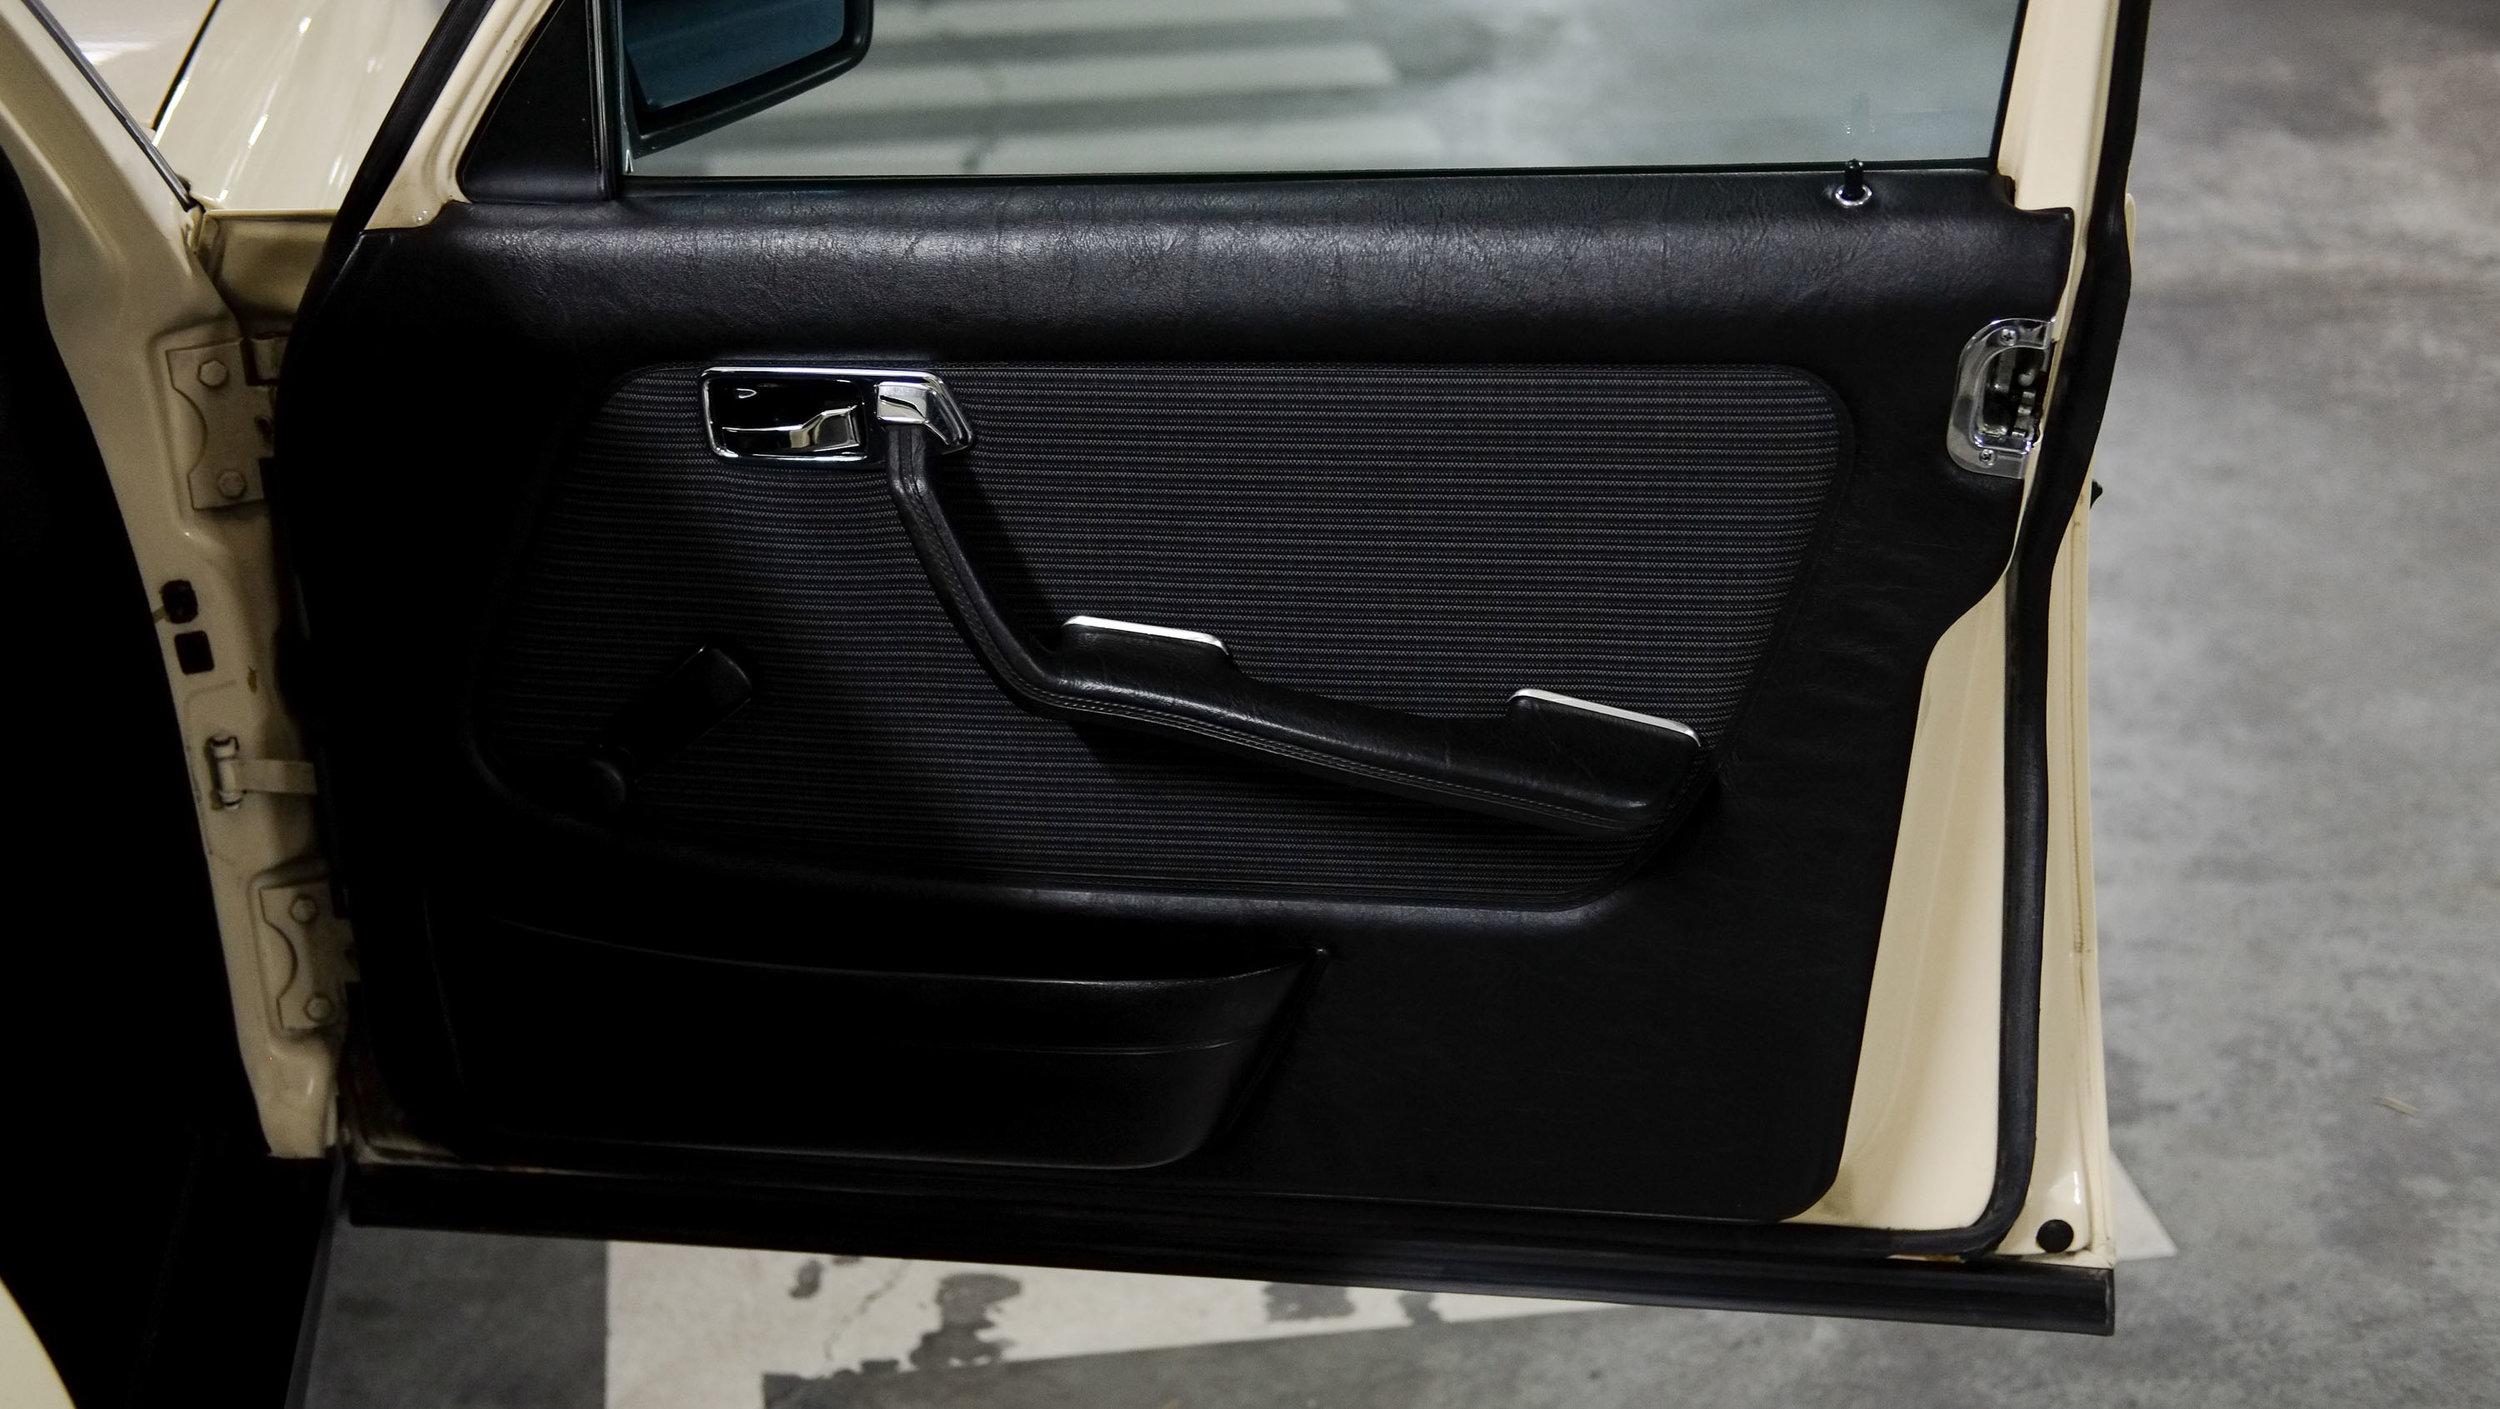 coolnvintage Mercedes-Benz W123 300D (28 of 59).jpg